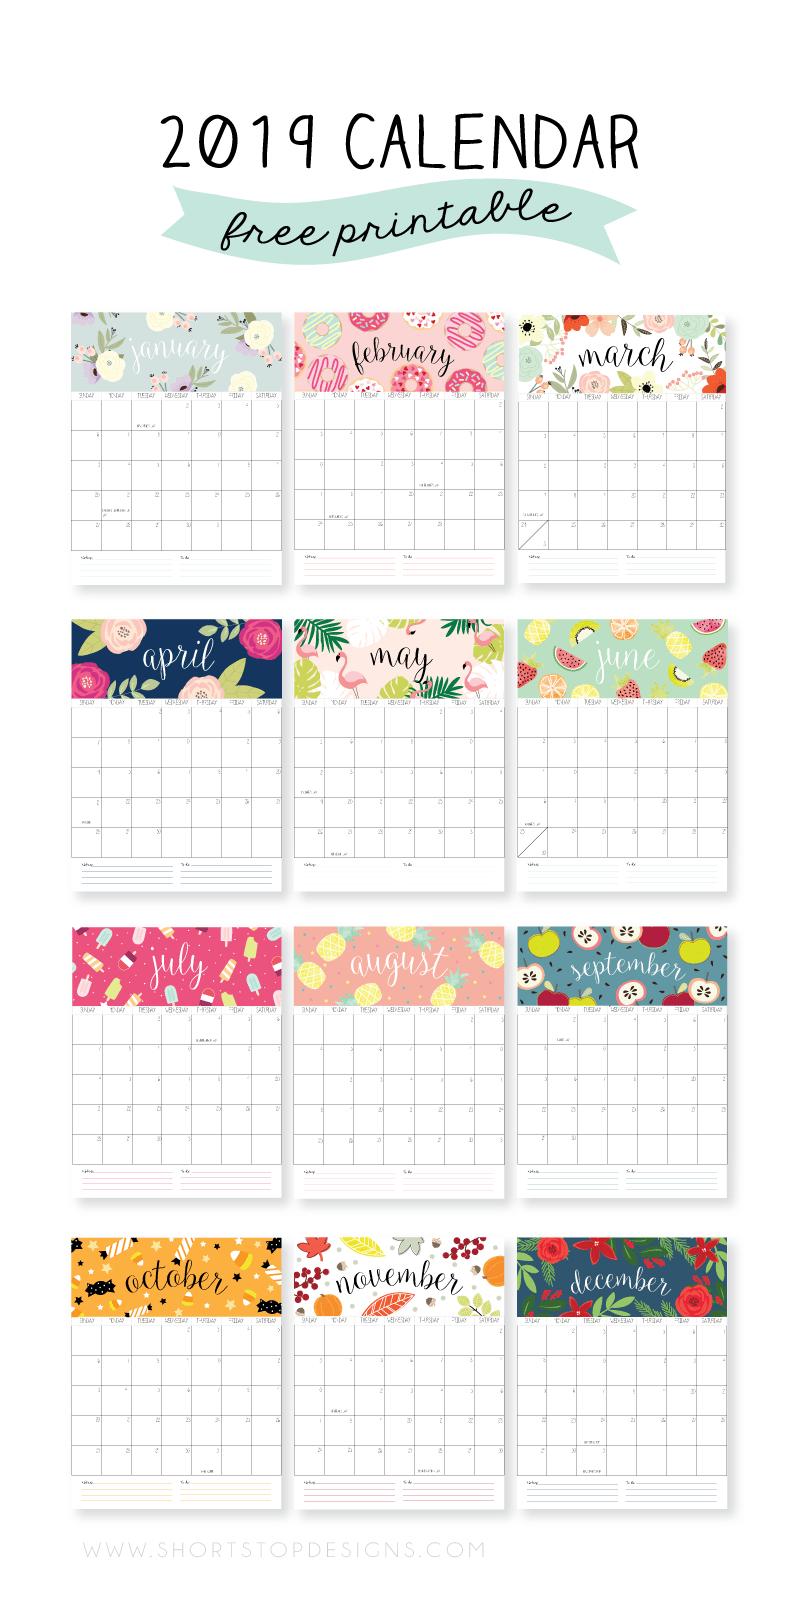 2019 Printable Calendar | Notebook | Calendar 2019 Printable, Free Calendar 2019 Diy